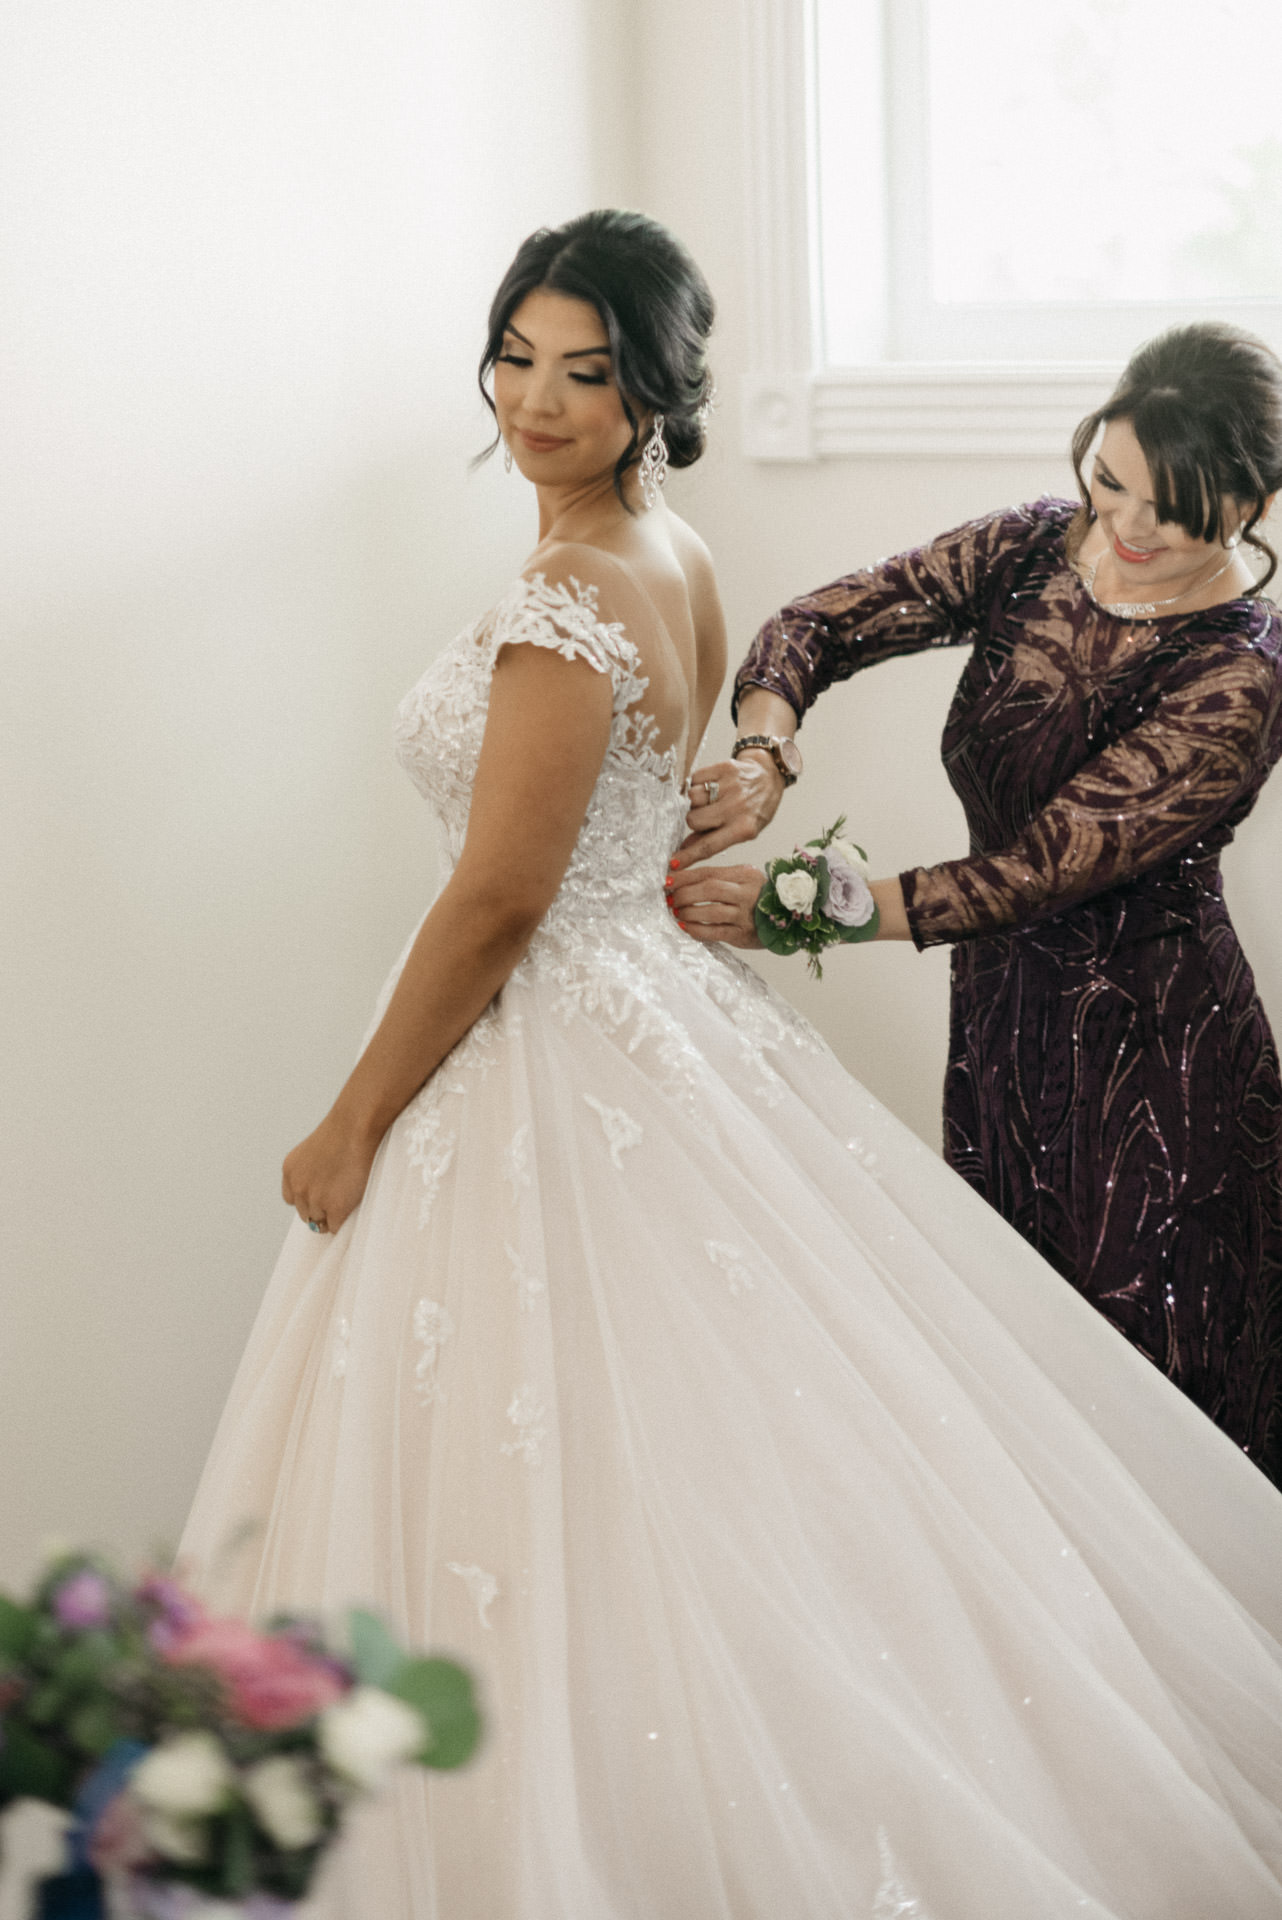 lexi-michael-wedding-blog-sm-23.jpg